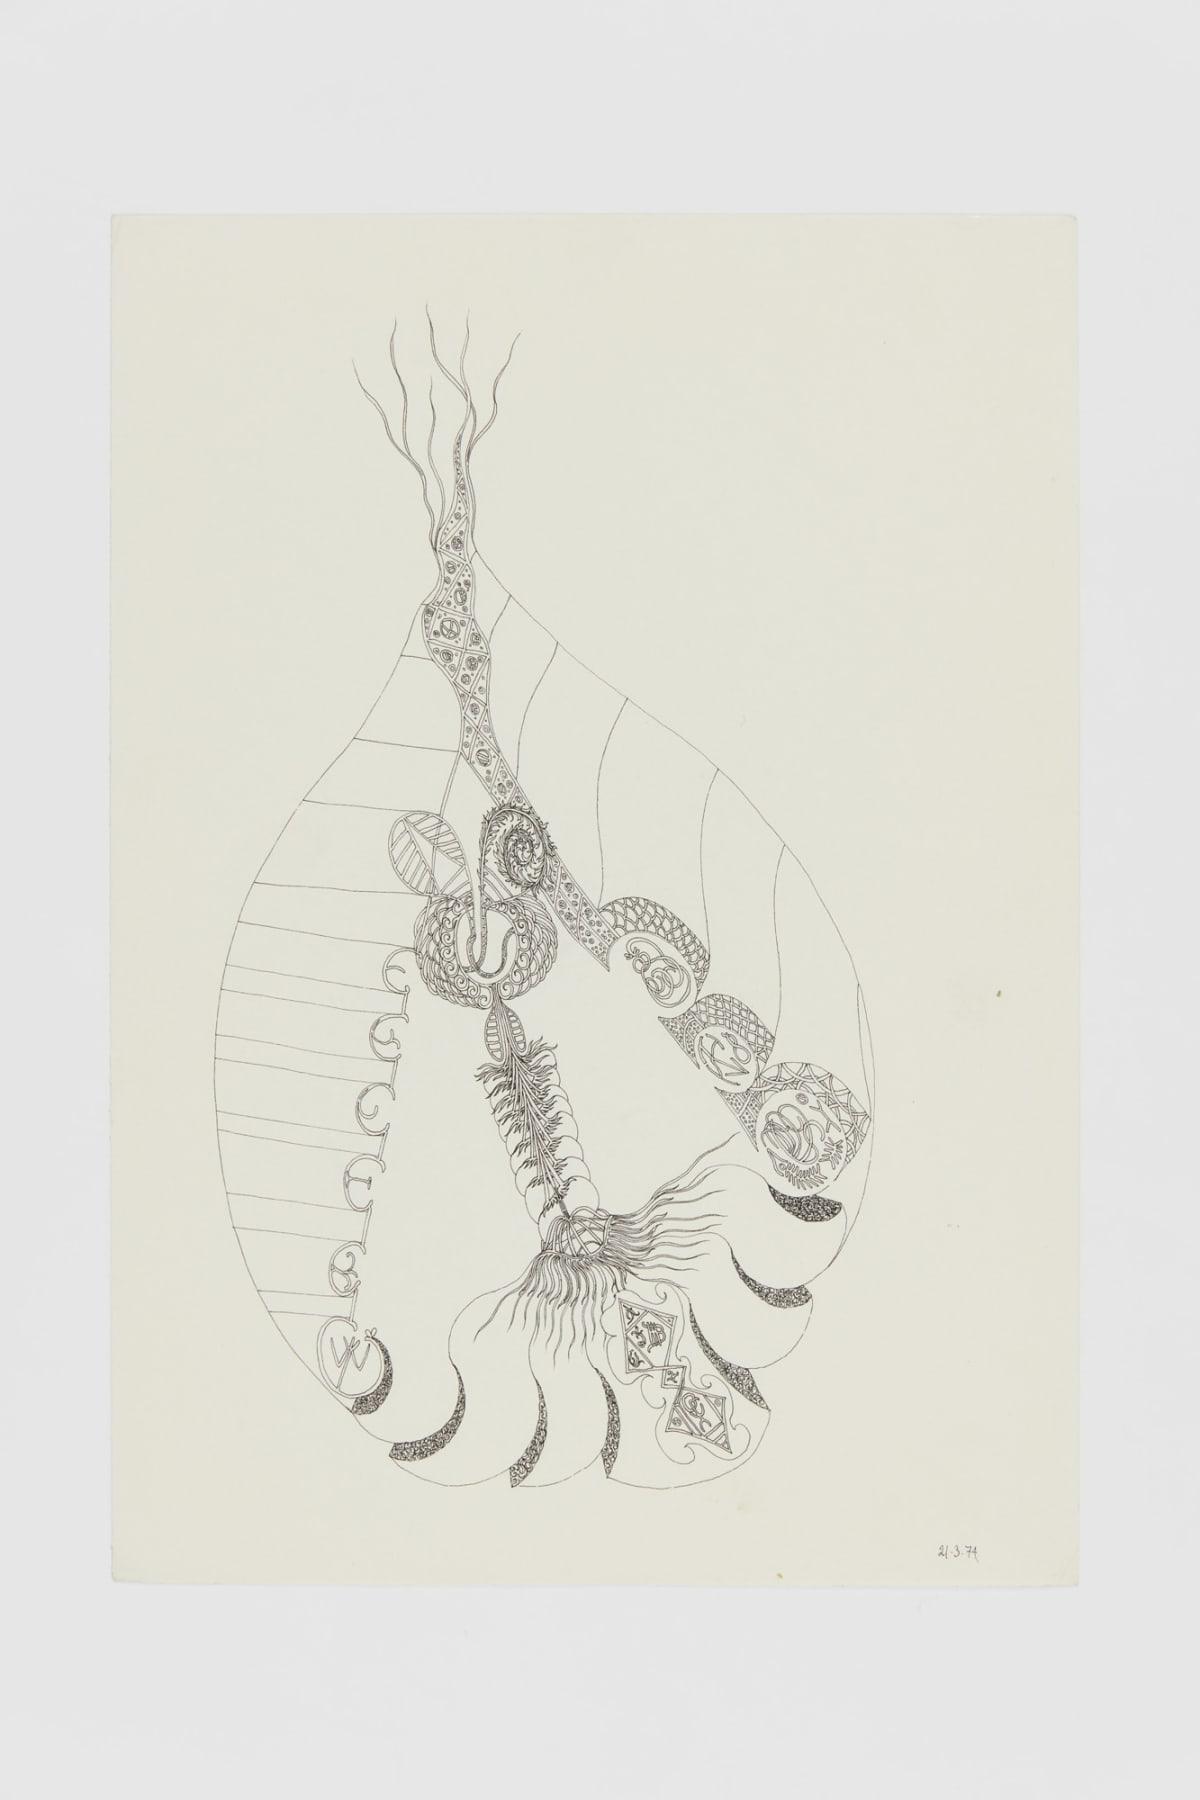 Ann CHURCHILL 21.3.74 (Daily drawings), 1974 Pen on paper 29.7 x 20.9 cm